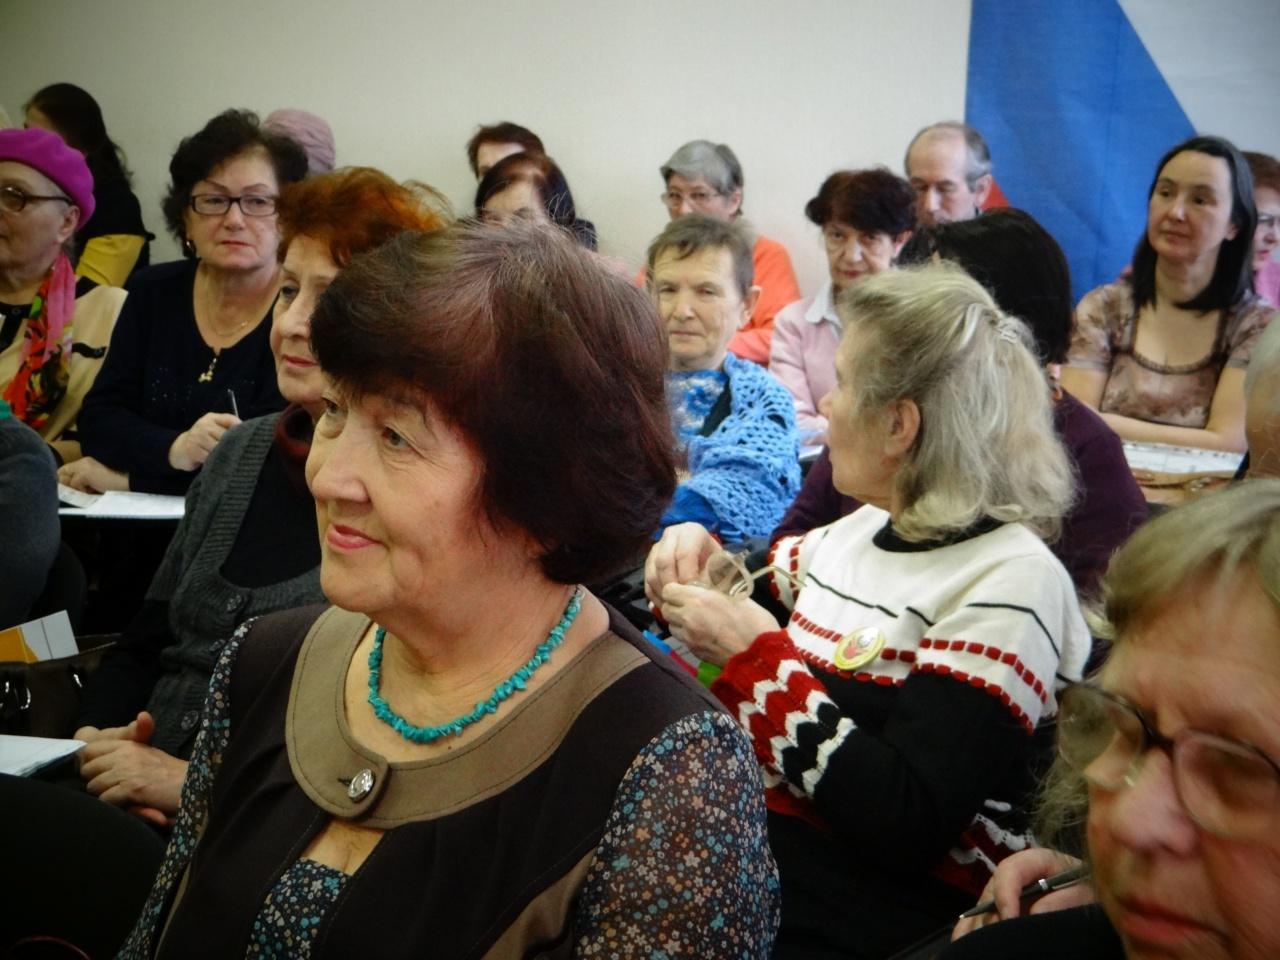 повышение (индексация) пенсии в 2017 году пенсионерам в Беларуси: последние новости